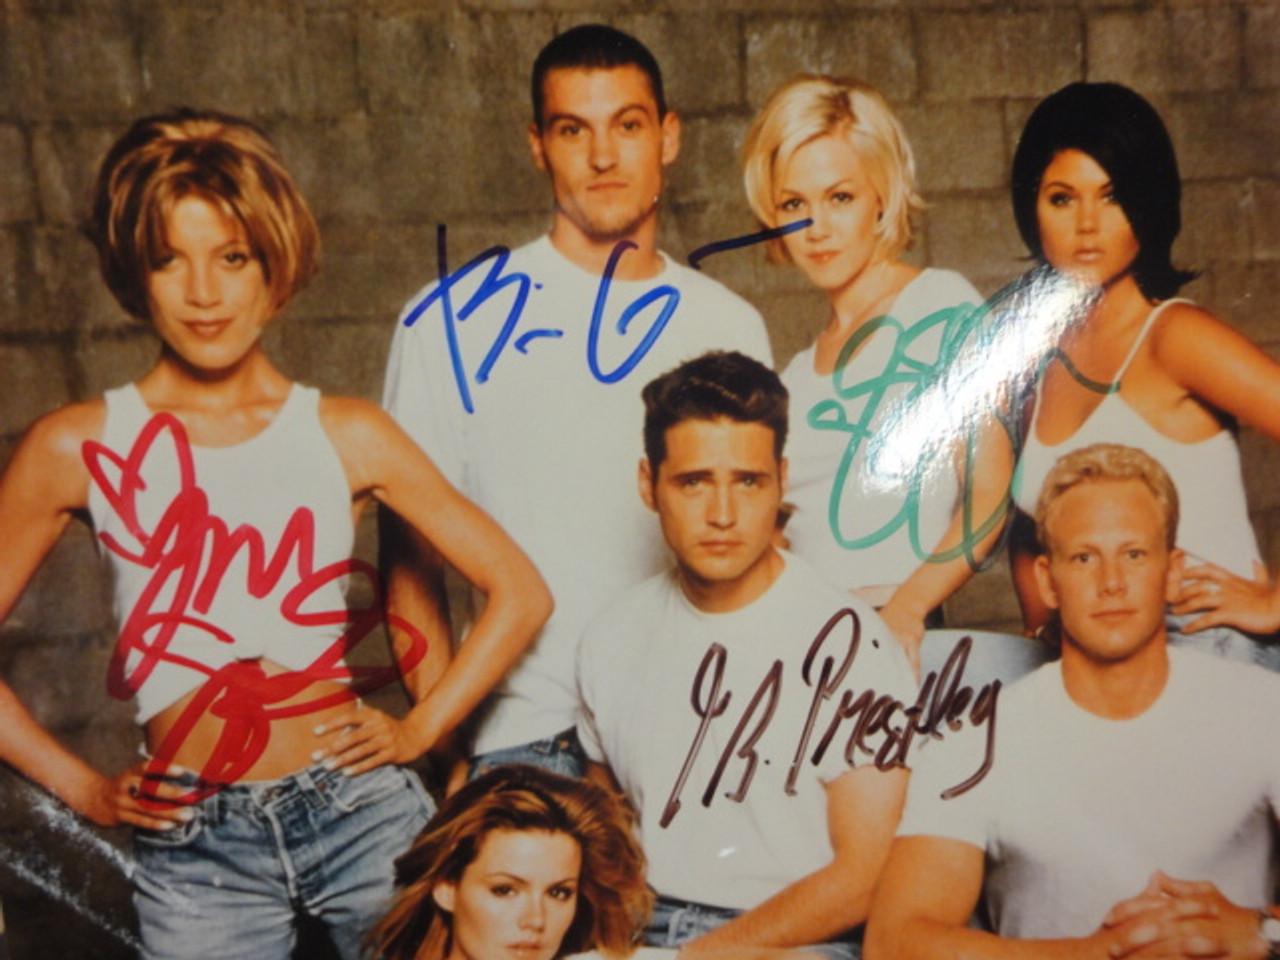 Beverly Hills 90210 Photo Jason Priestley Tori Spelling Jennie Garth Brian Austin Green Signed Autograph